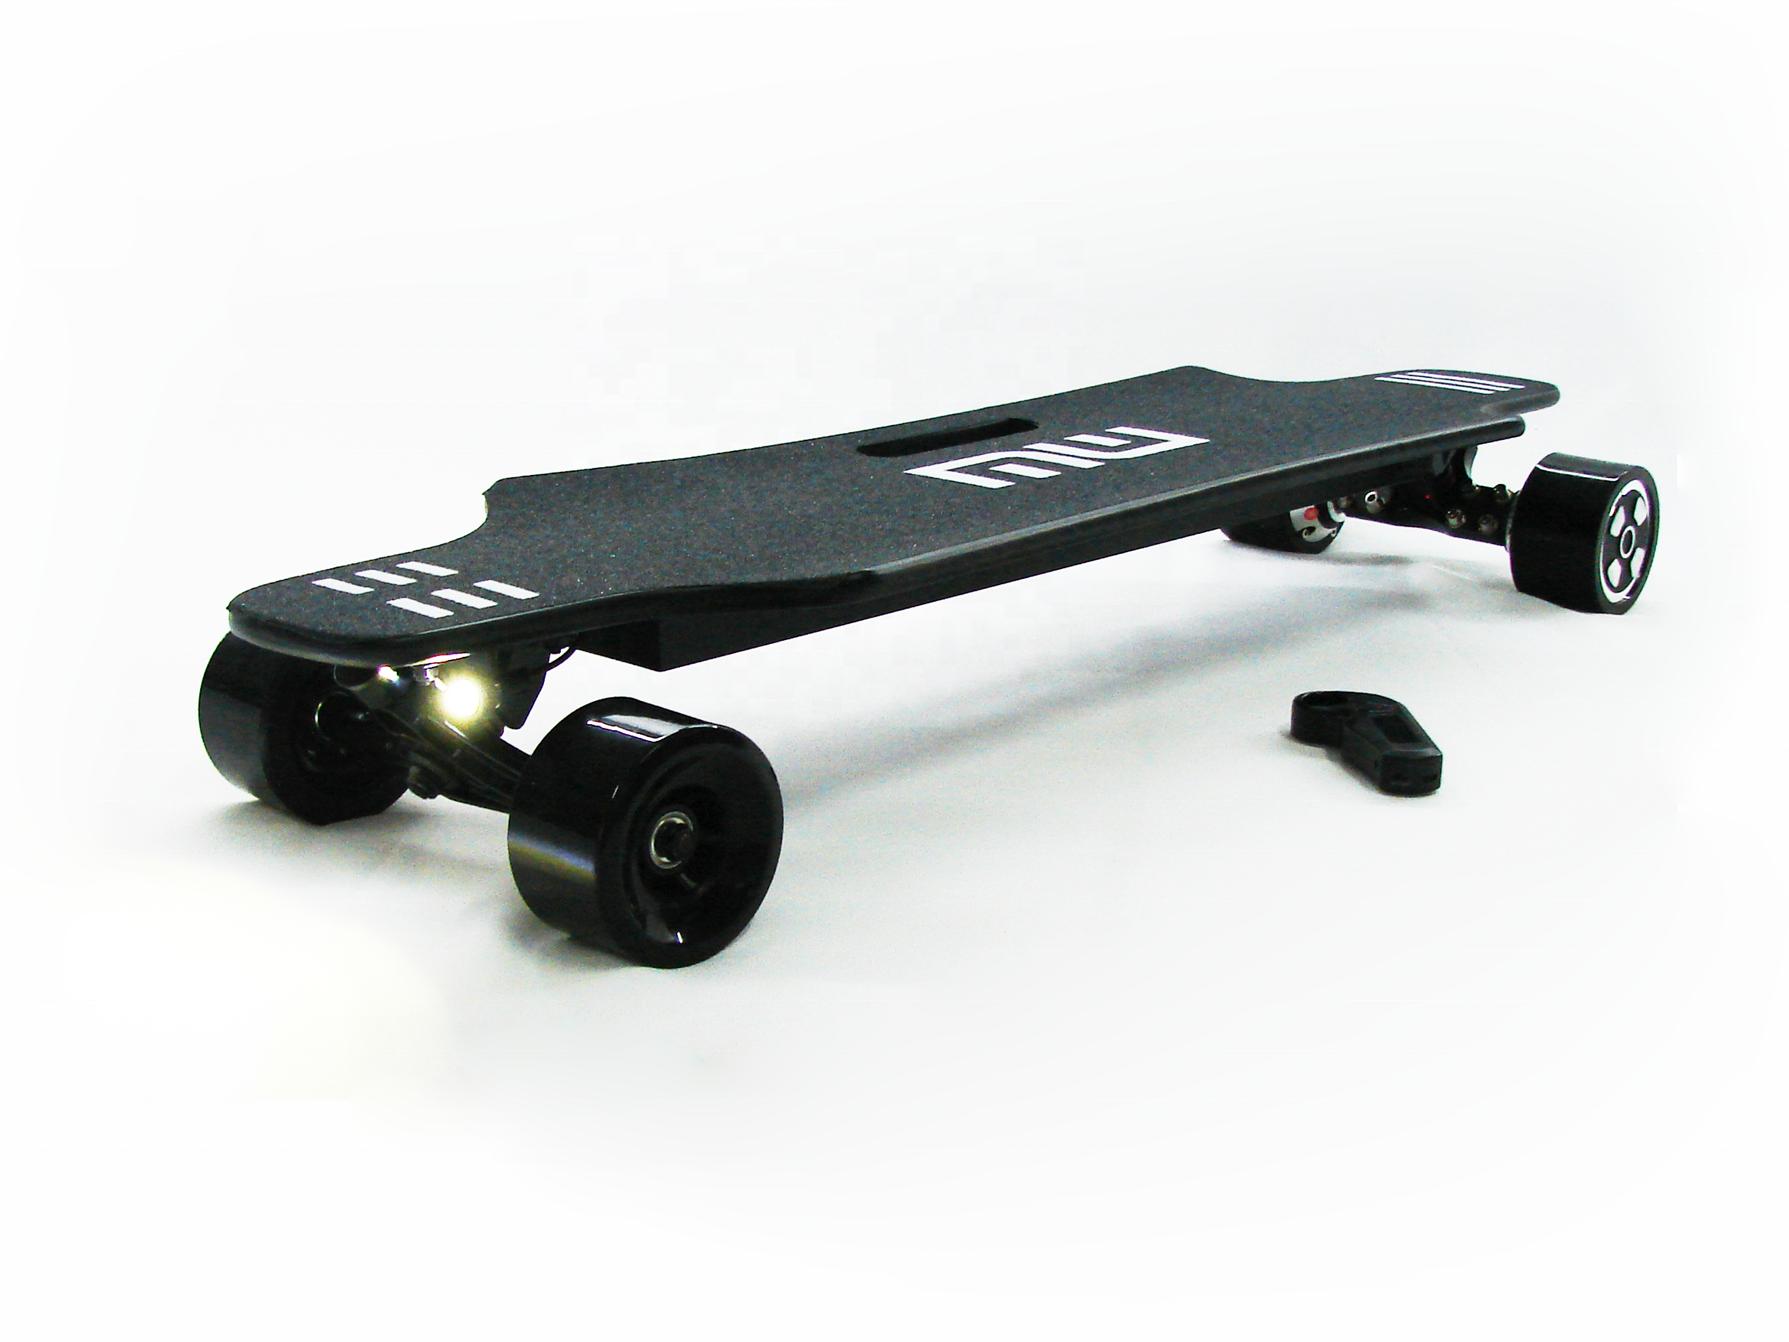 diy fast adult bamboo remote control dual hub motor off-road e longboard electric skateboard 25 mph